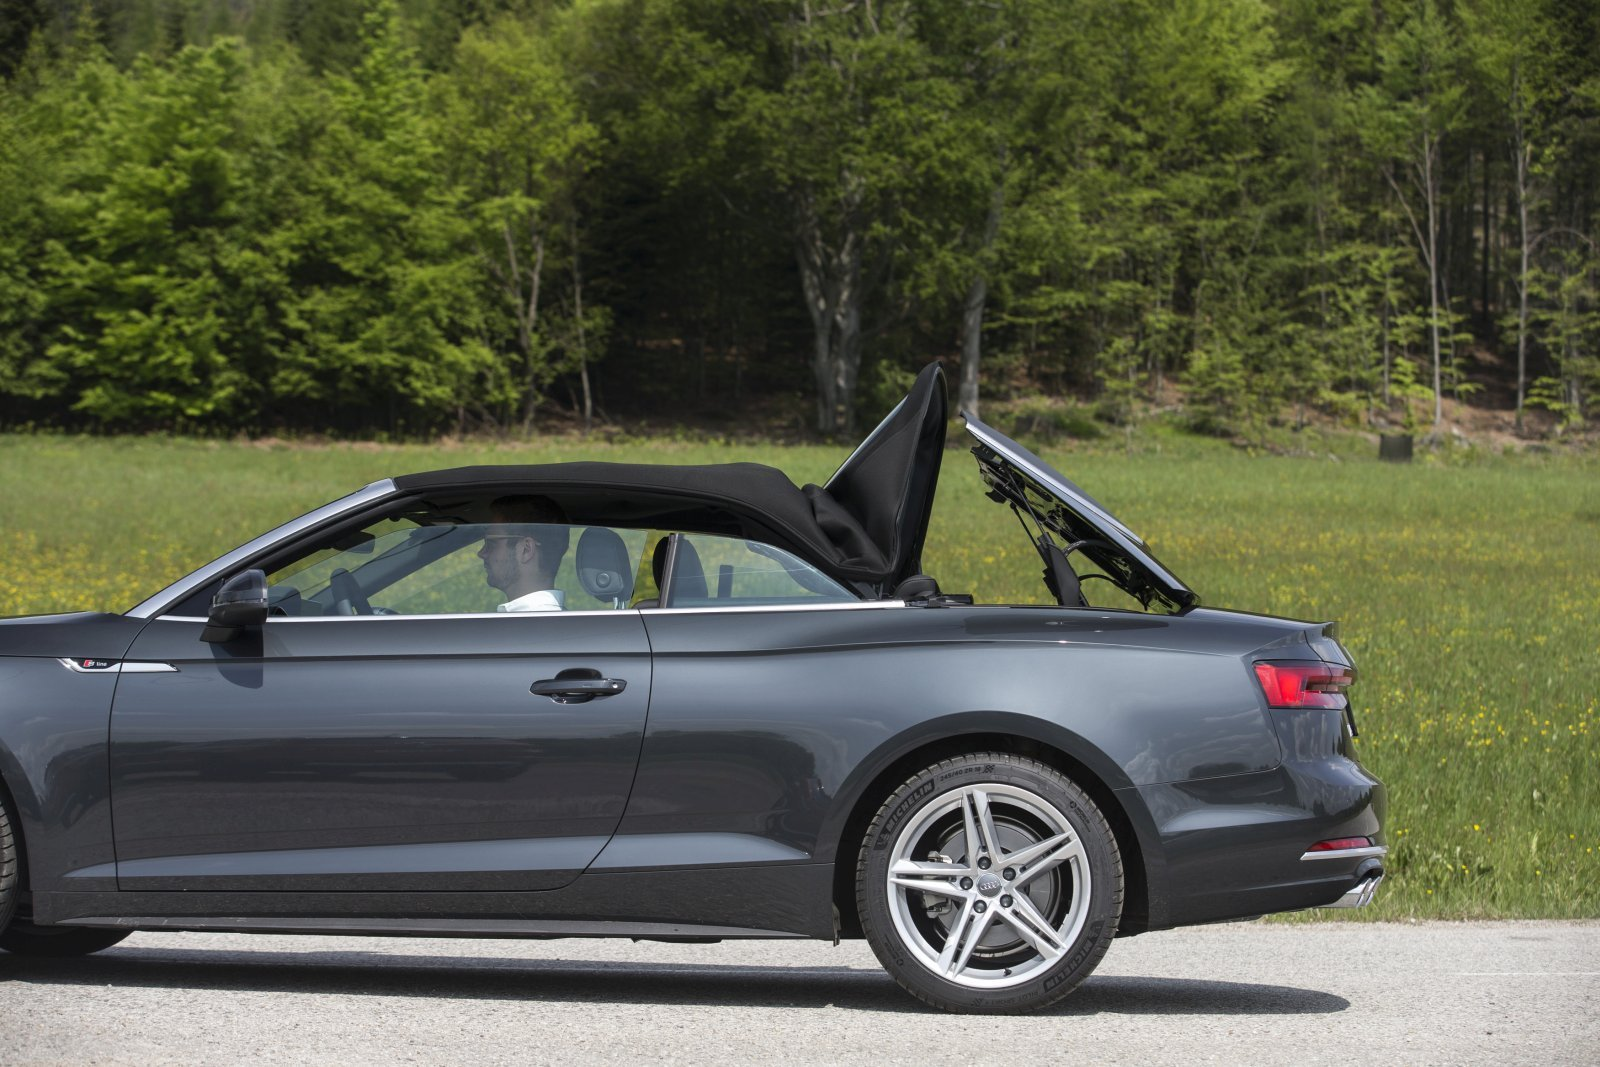 test audi a5 cabriolet 2 0 tdi sport alles auto. Black Bedroom Furniture Sets. Home Design Ideas